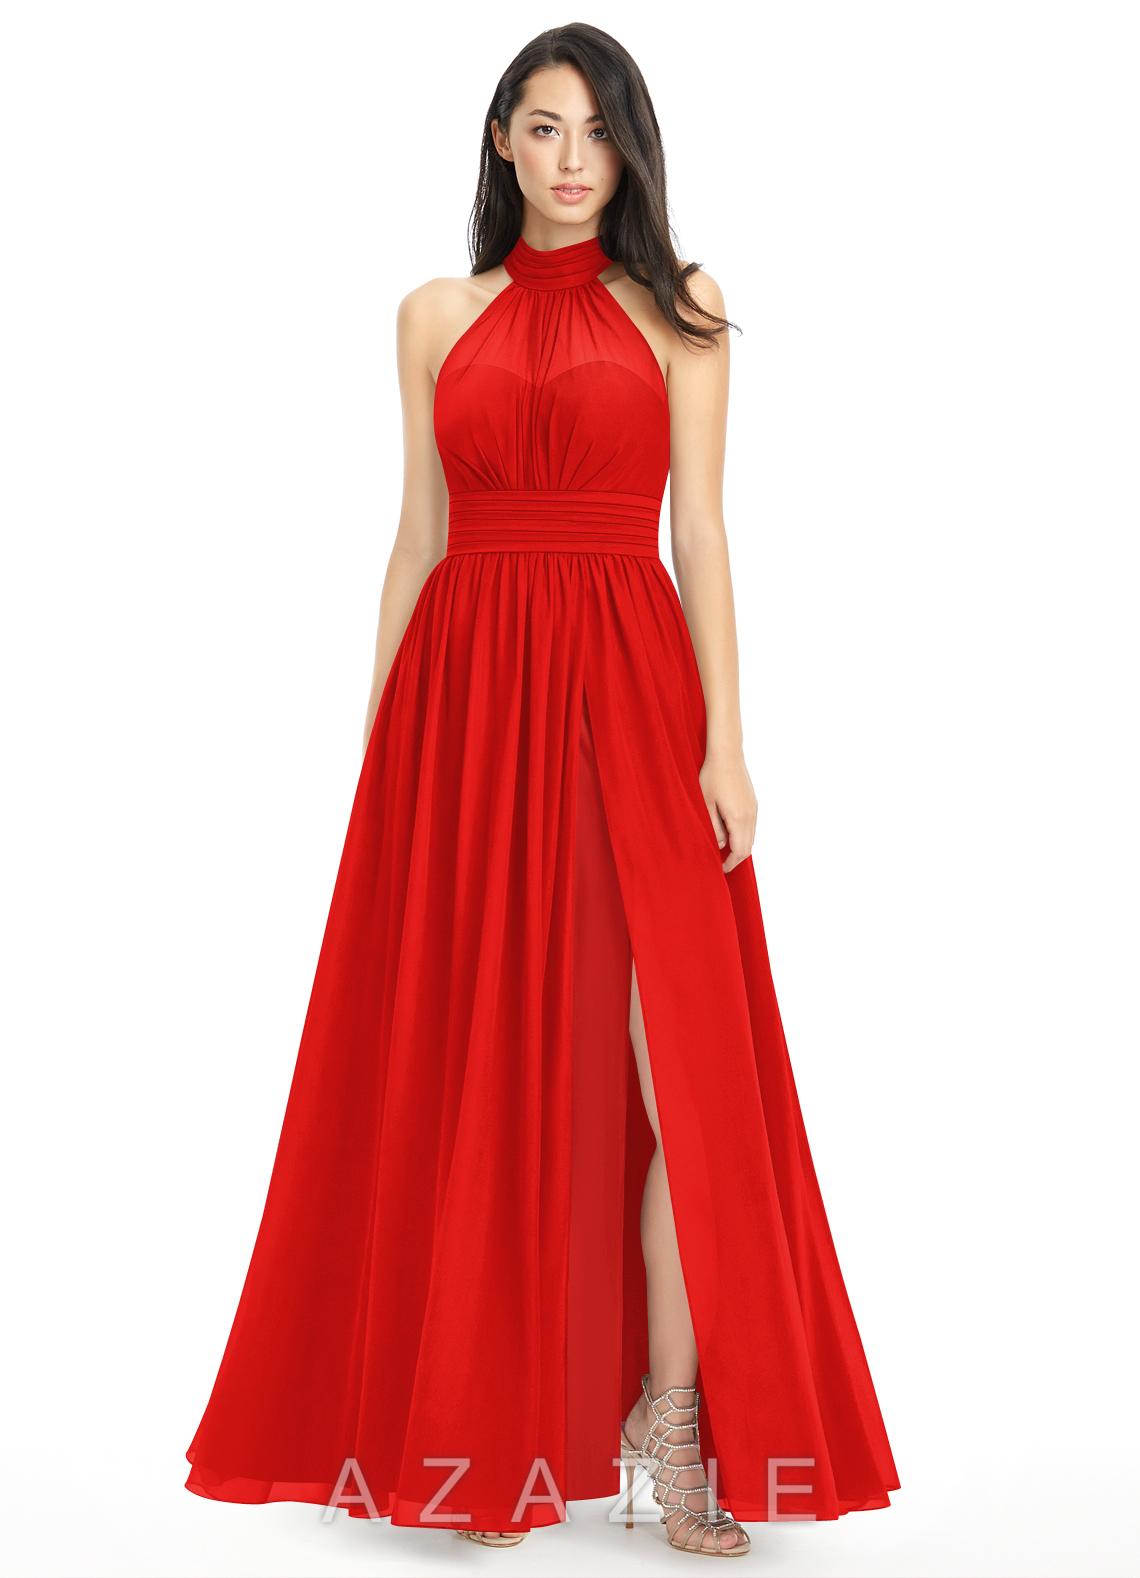 Azazie iman bridesmaid dress azazie color red ombrellifo Choice Image